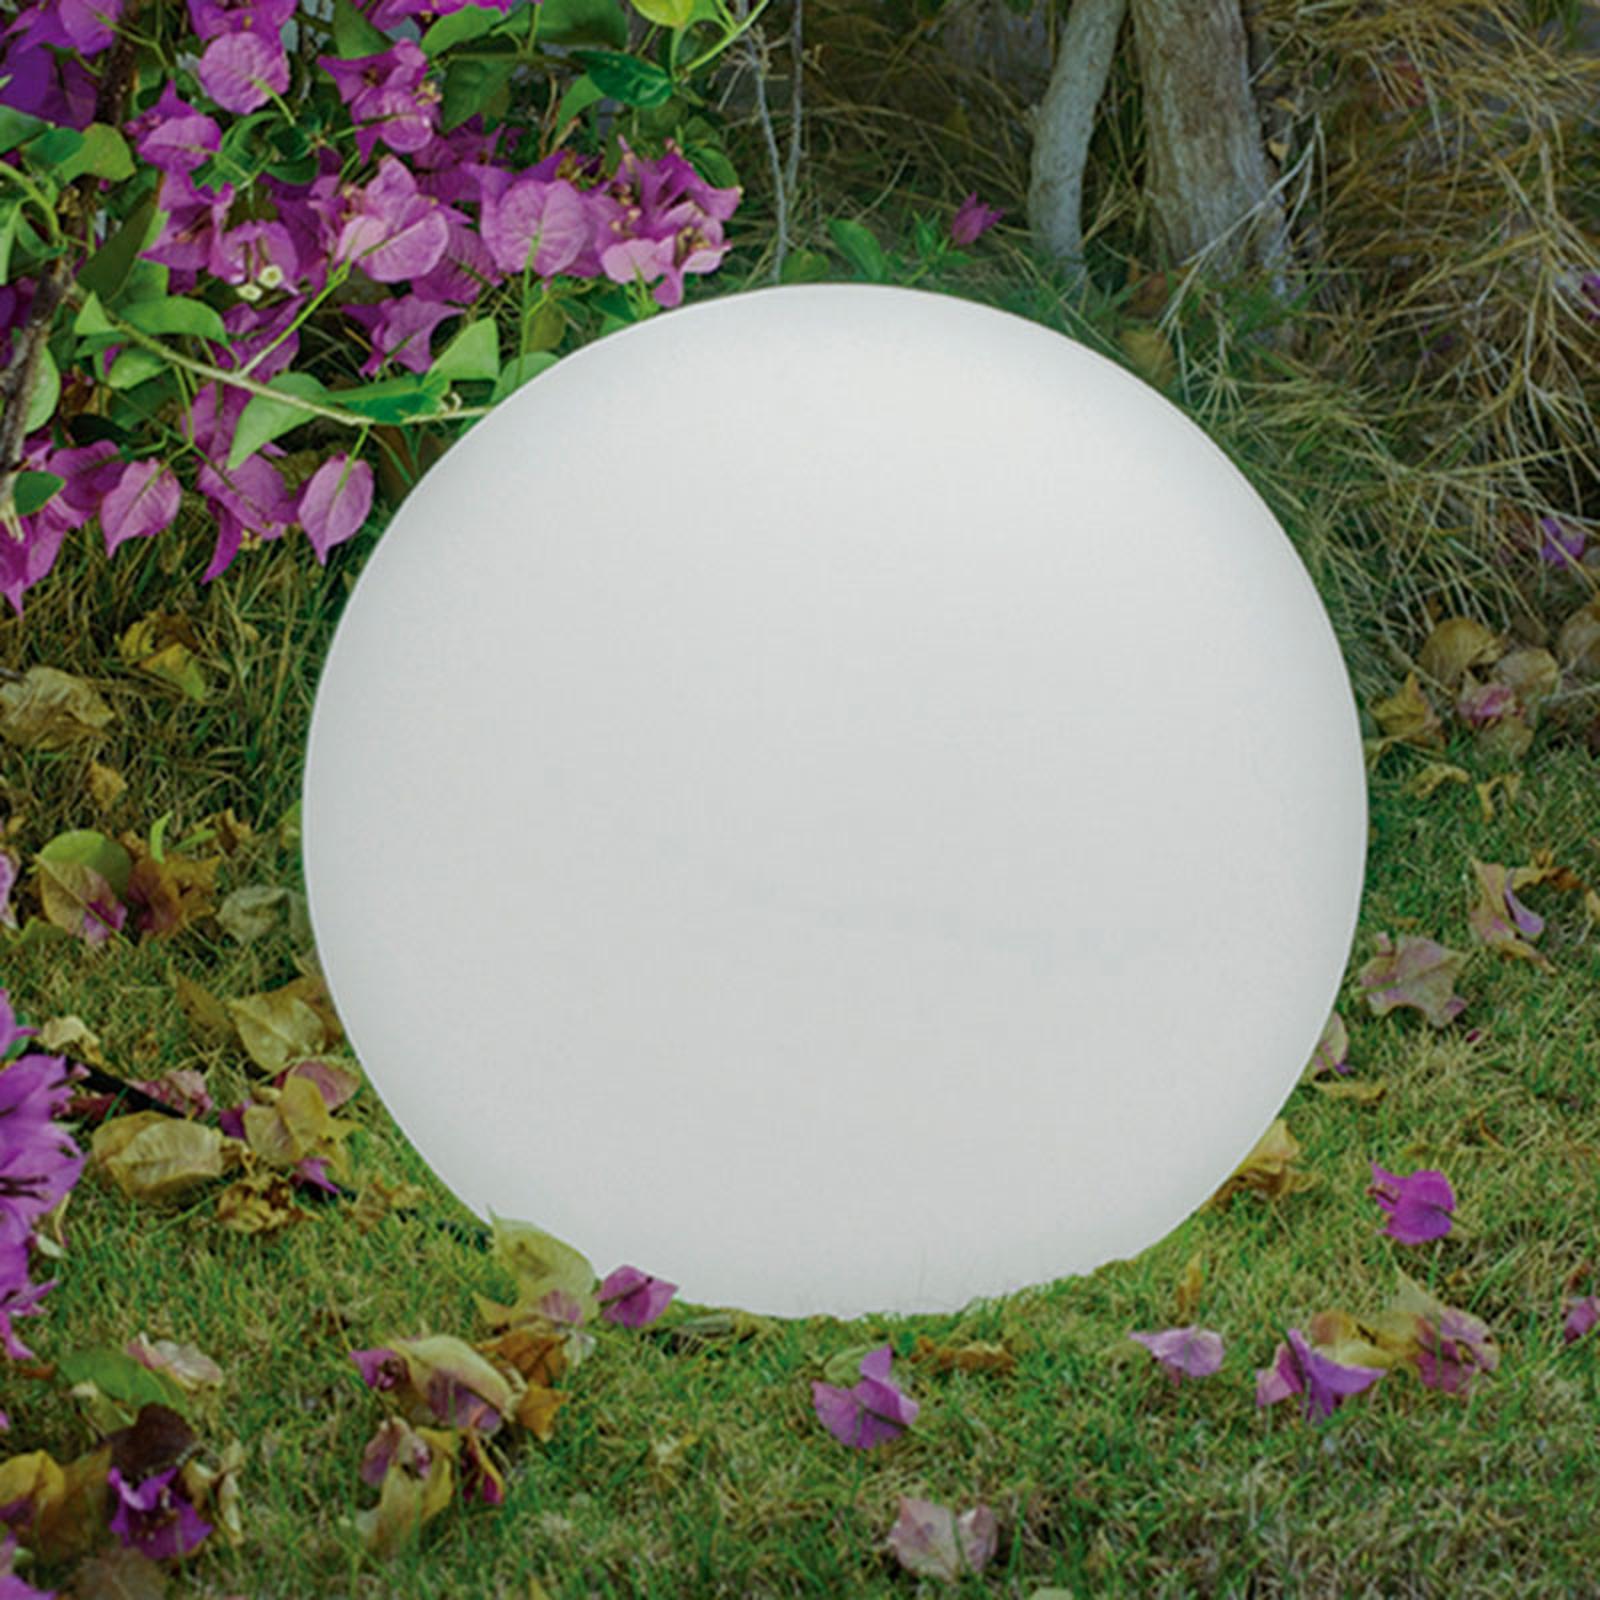 Newgarden Buly golvlampa i kulform, Ø 20 cm